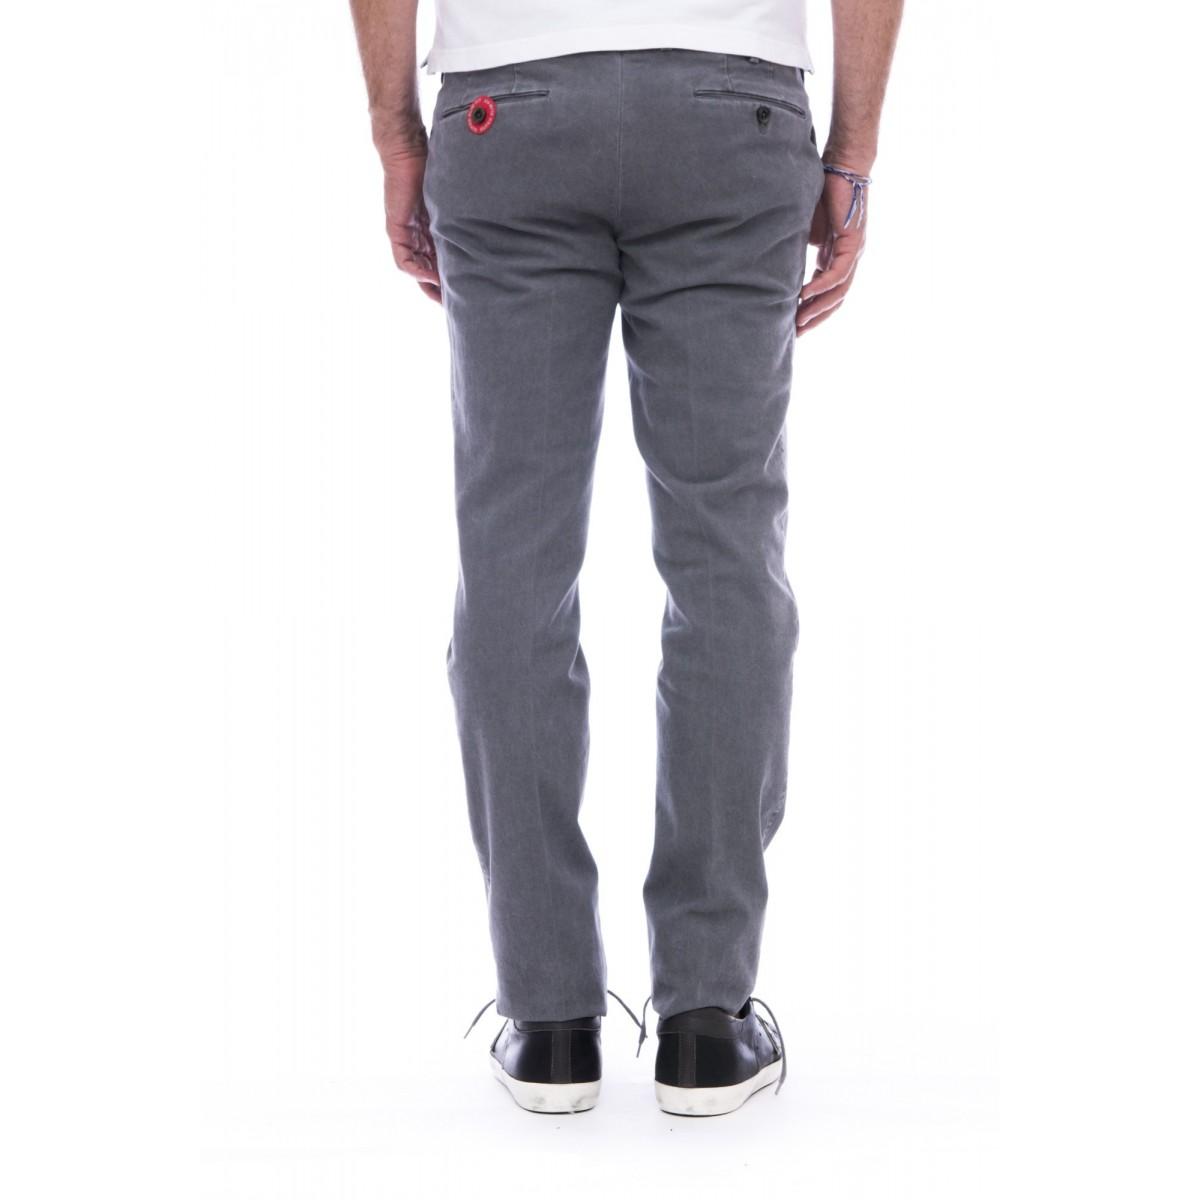 Pantalone uomo Pt 01 - Cpd501 tu45 oxford lavato strech